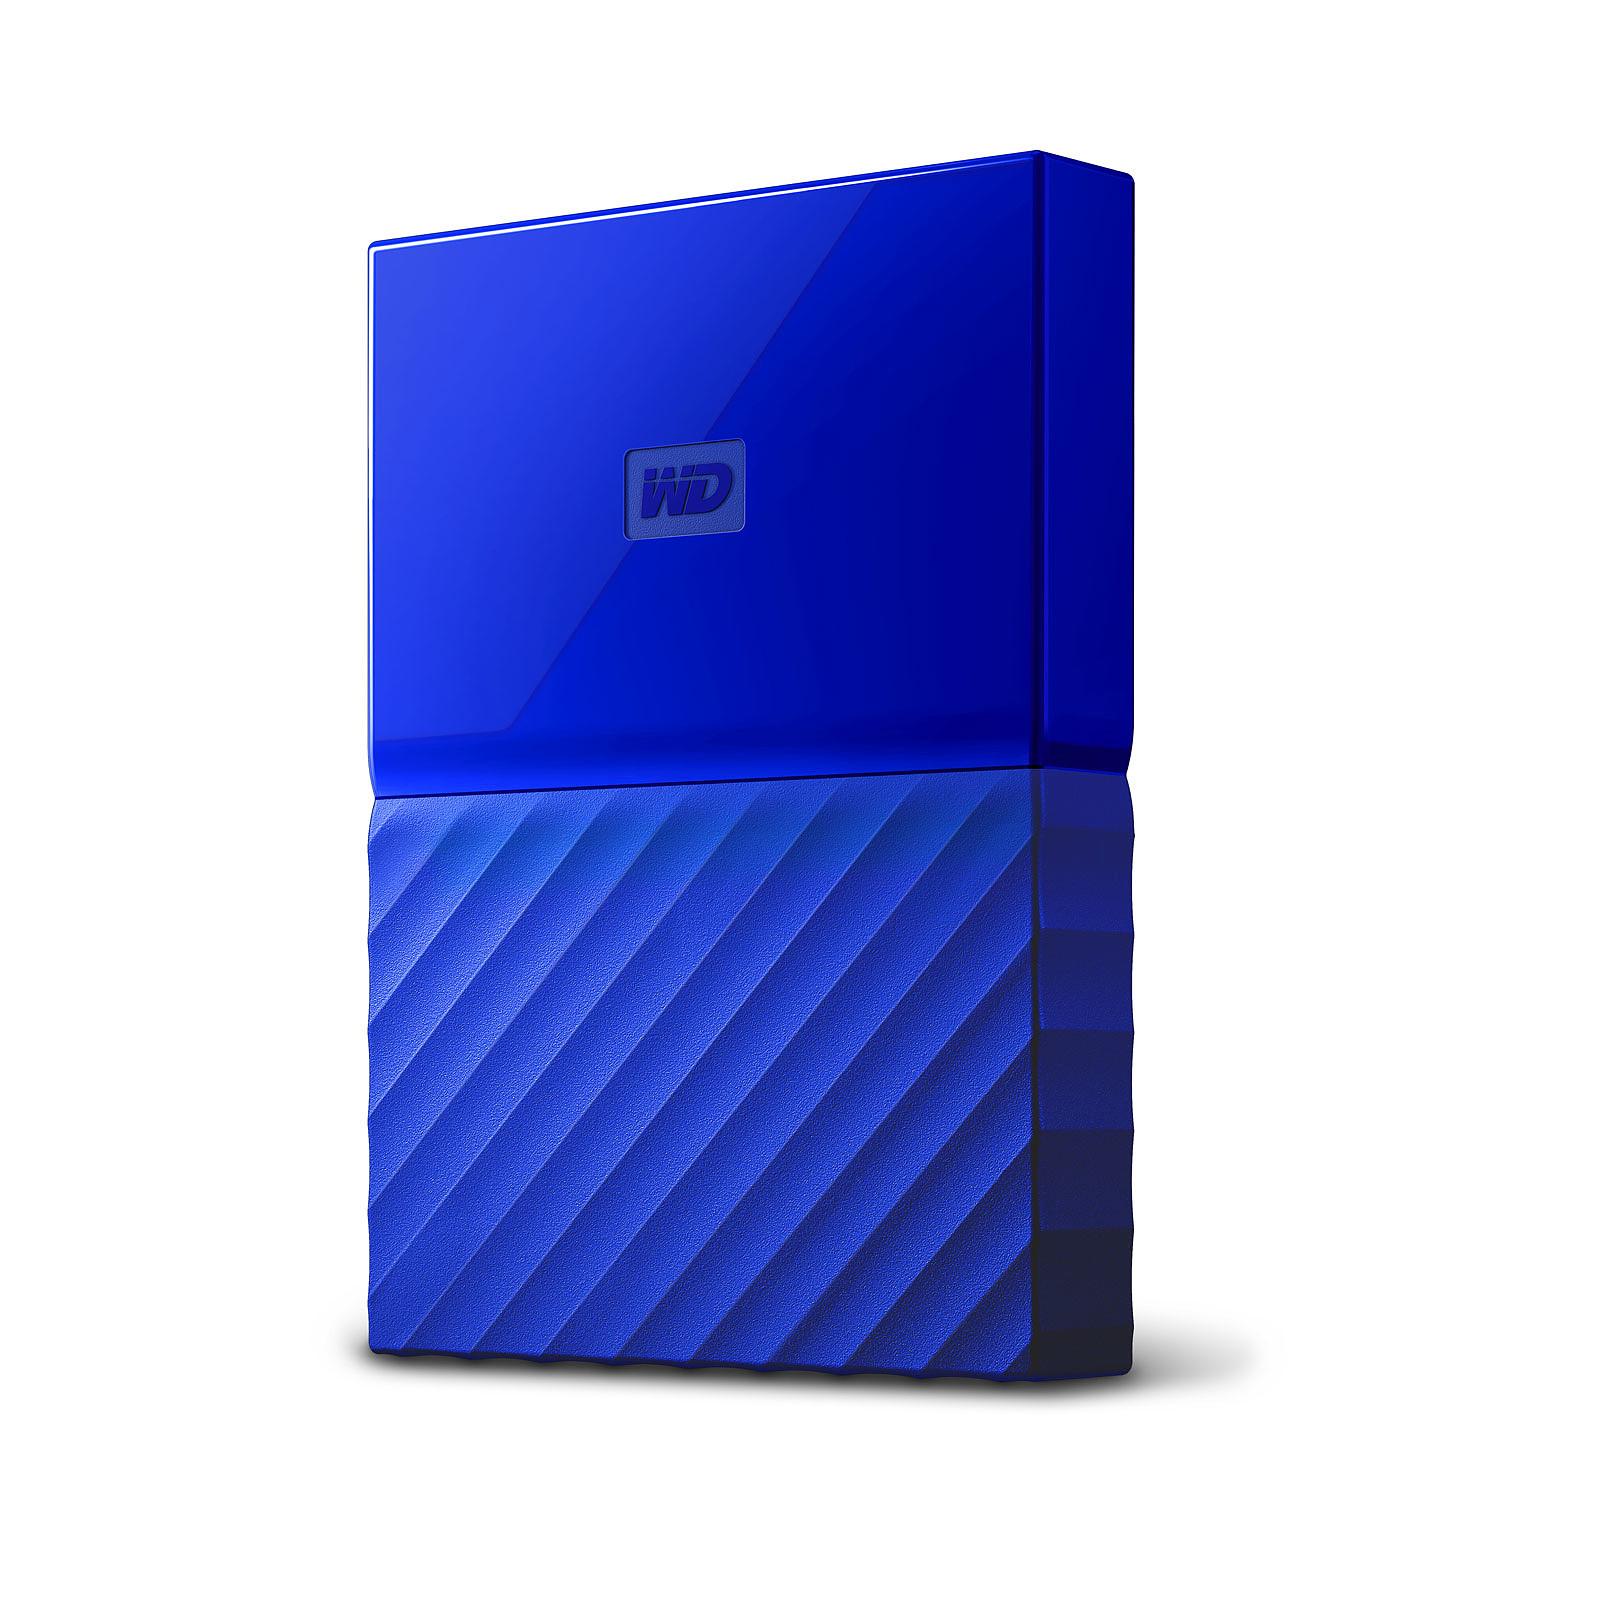 WD My Passport Thin 2 To Bleu (USB 3.0)